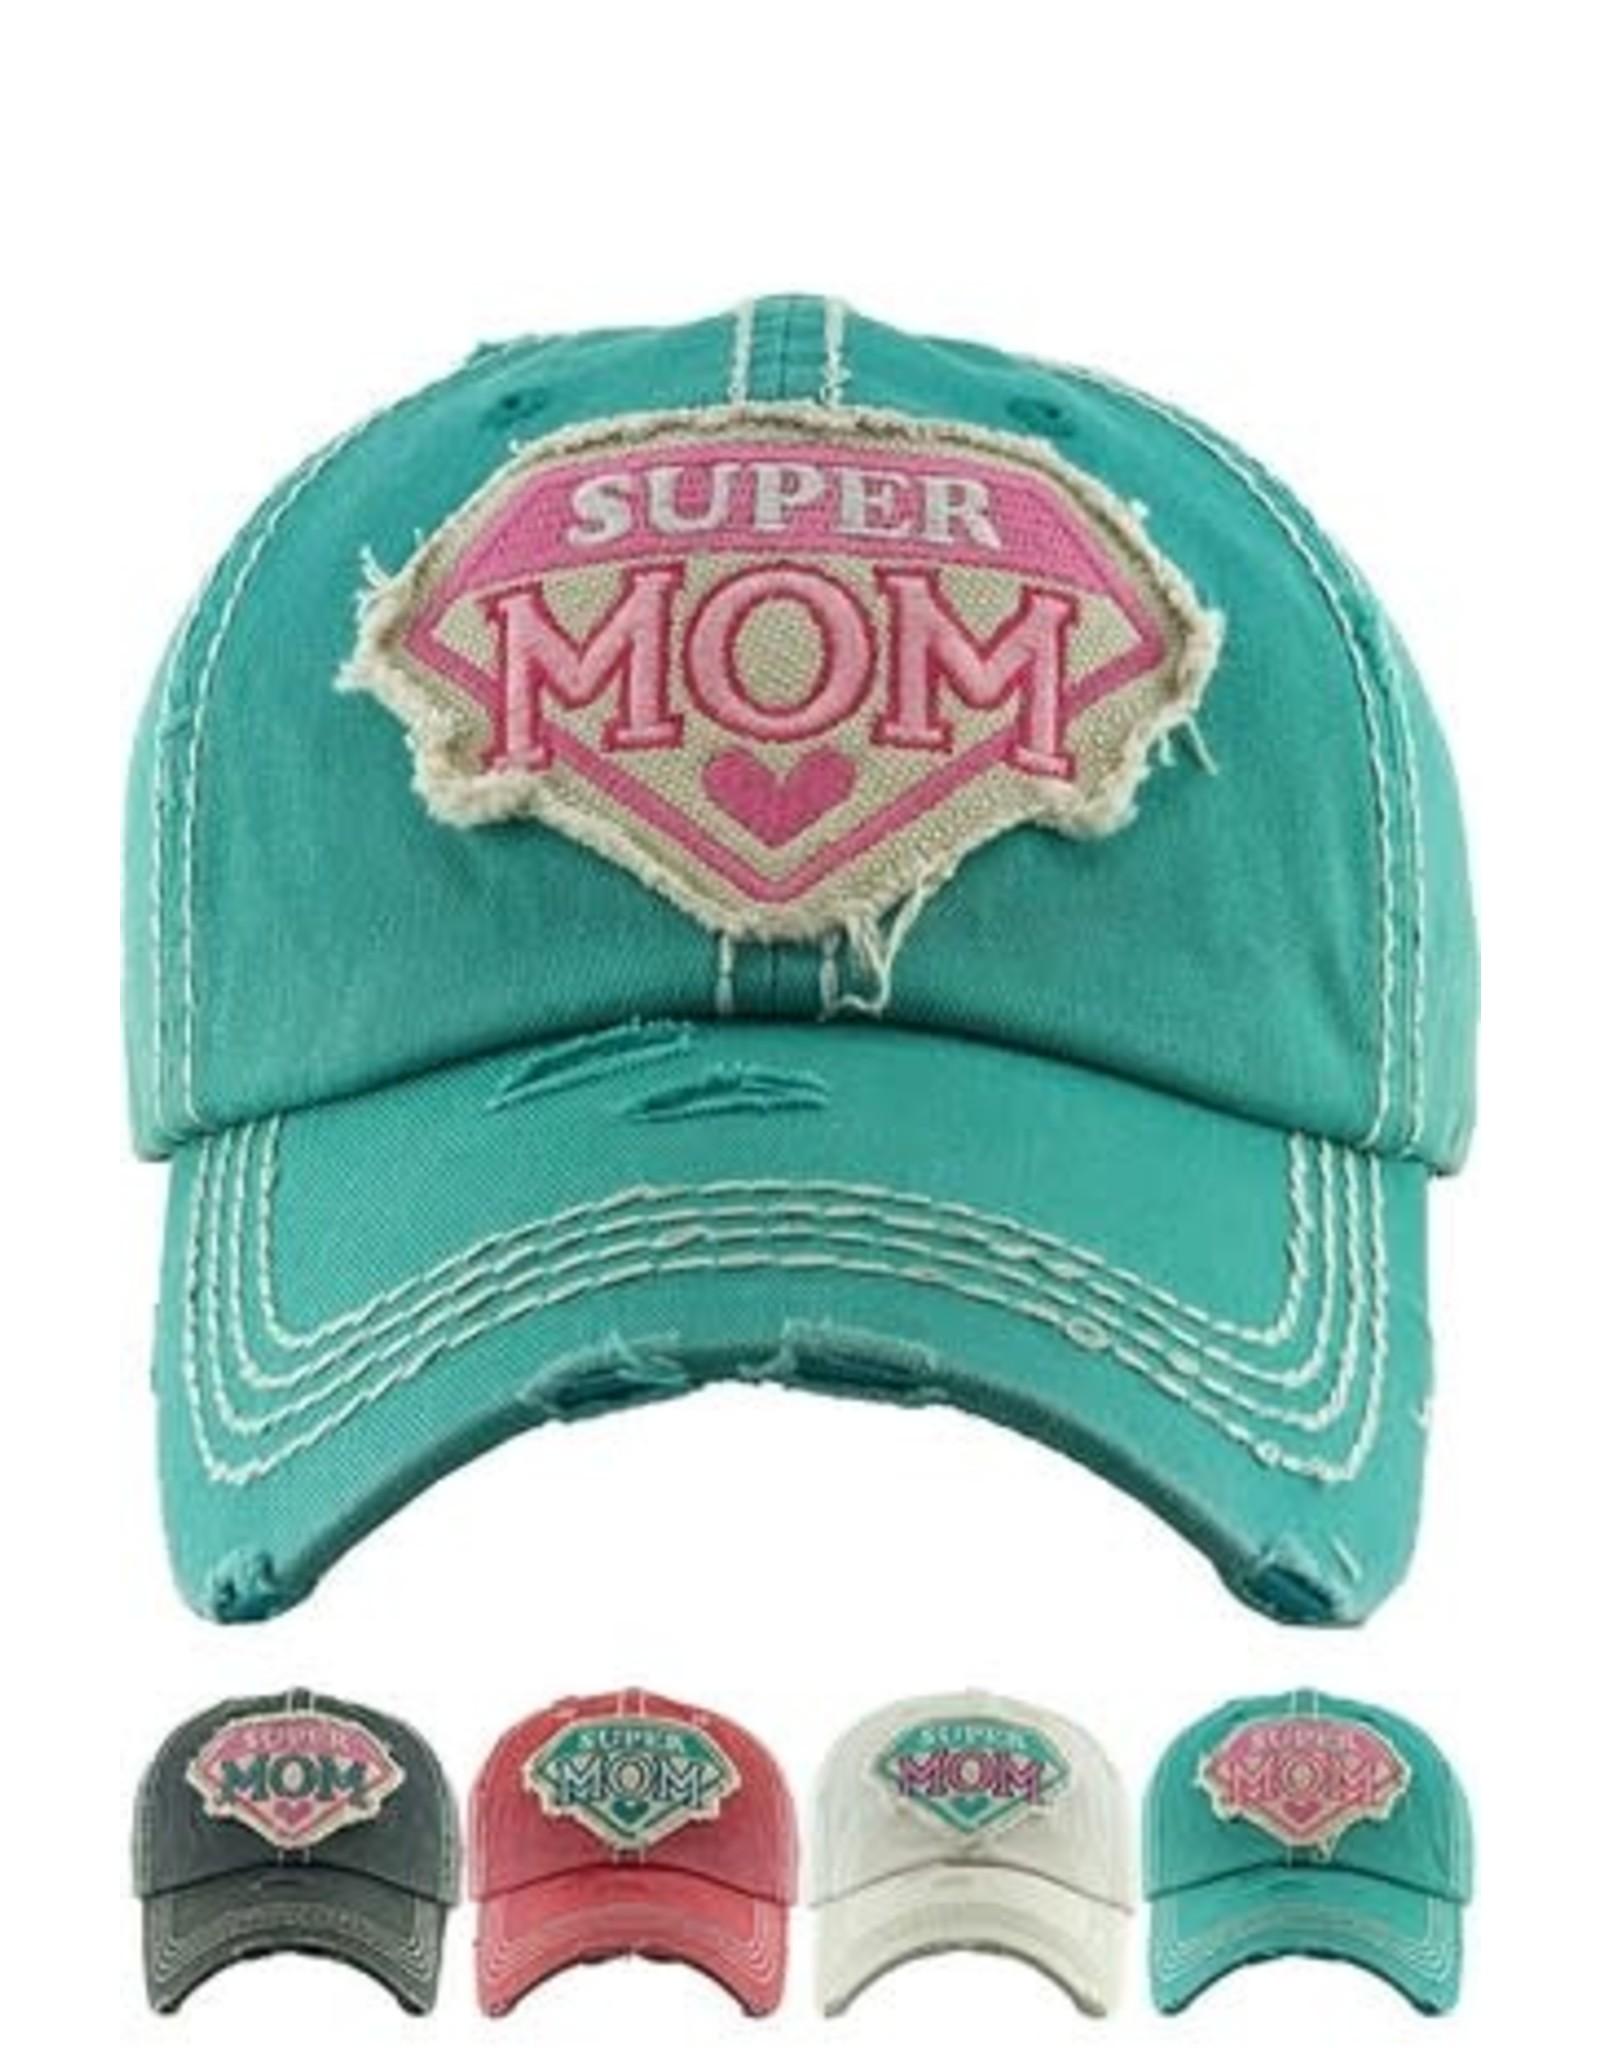 Super Mom Vintage Distressed Cap